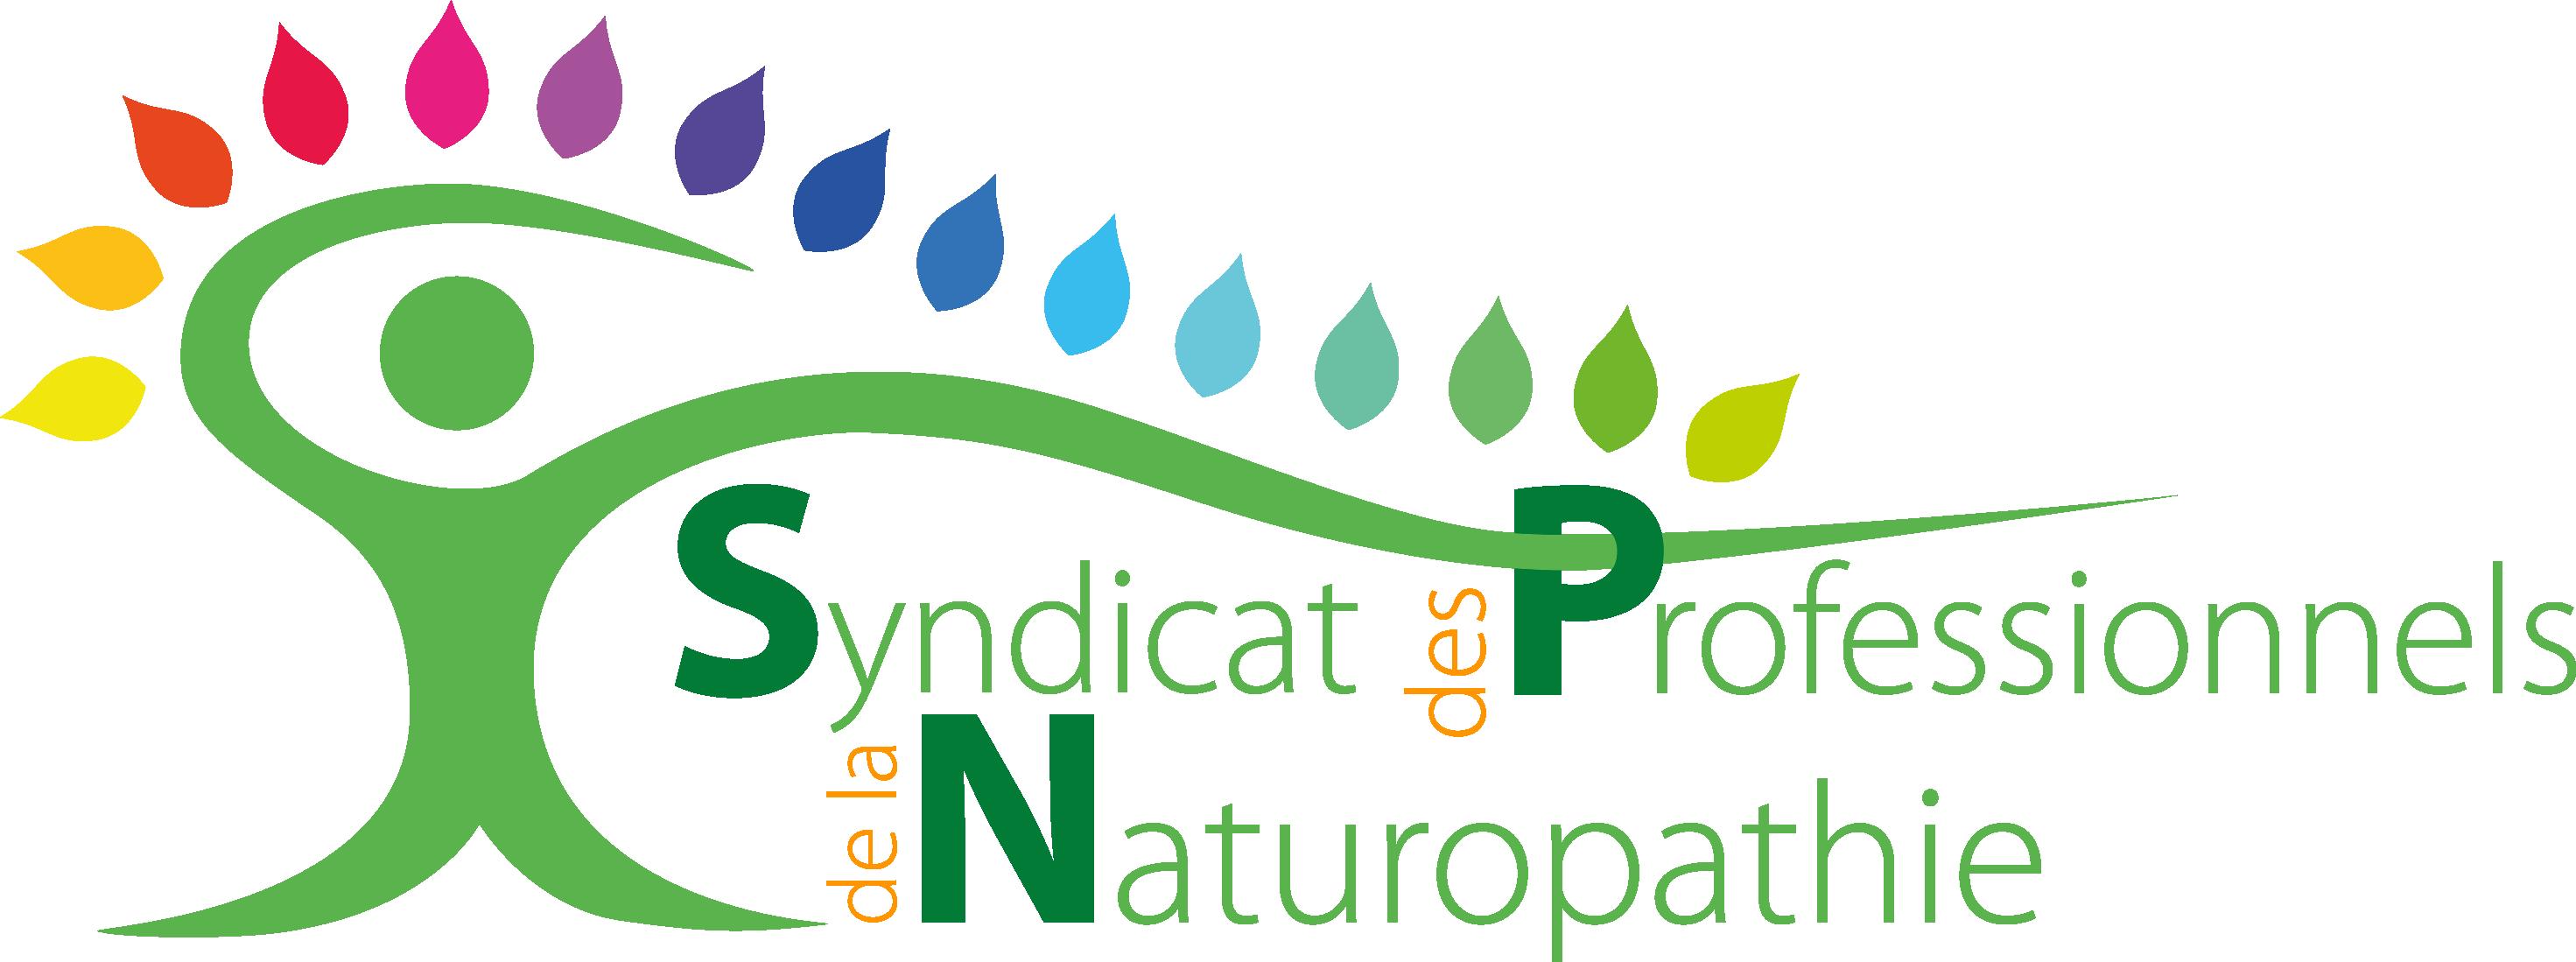 logo-syndicat-professionnels-naturopathie-valerie-maillard-rouen